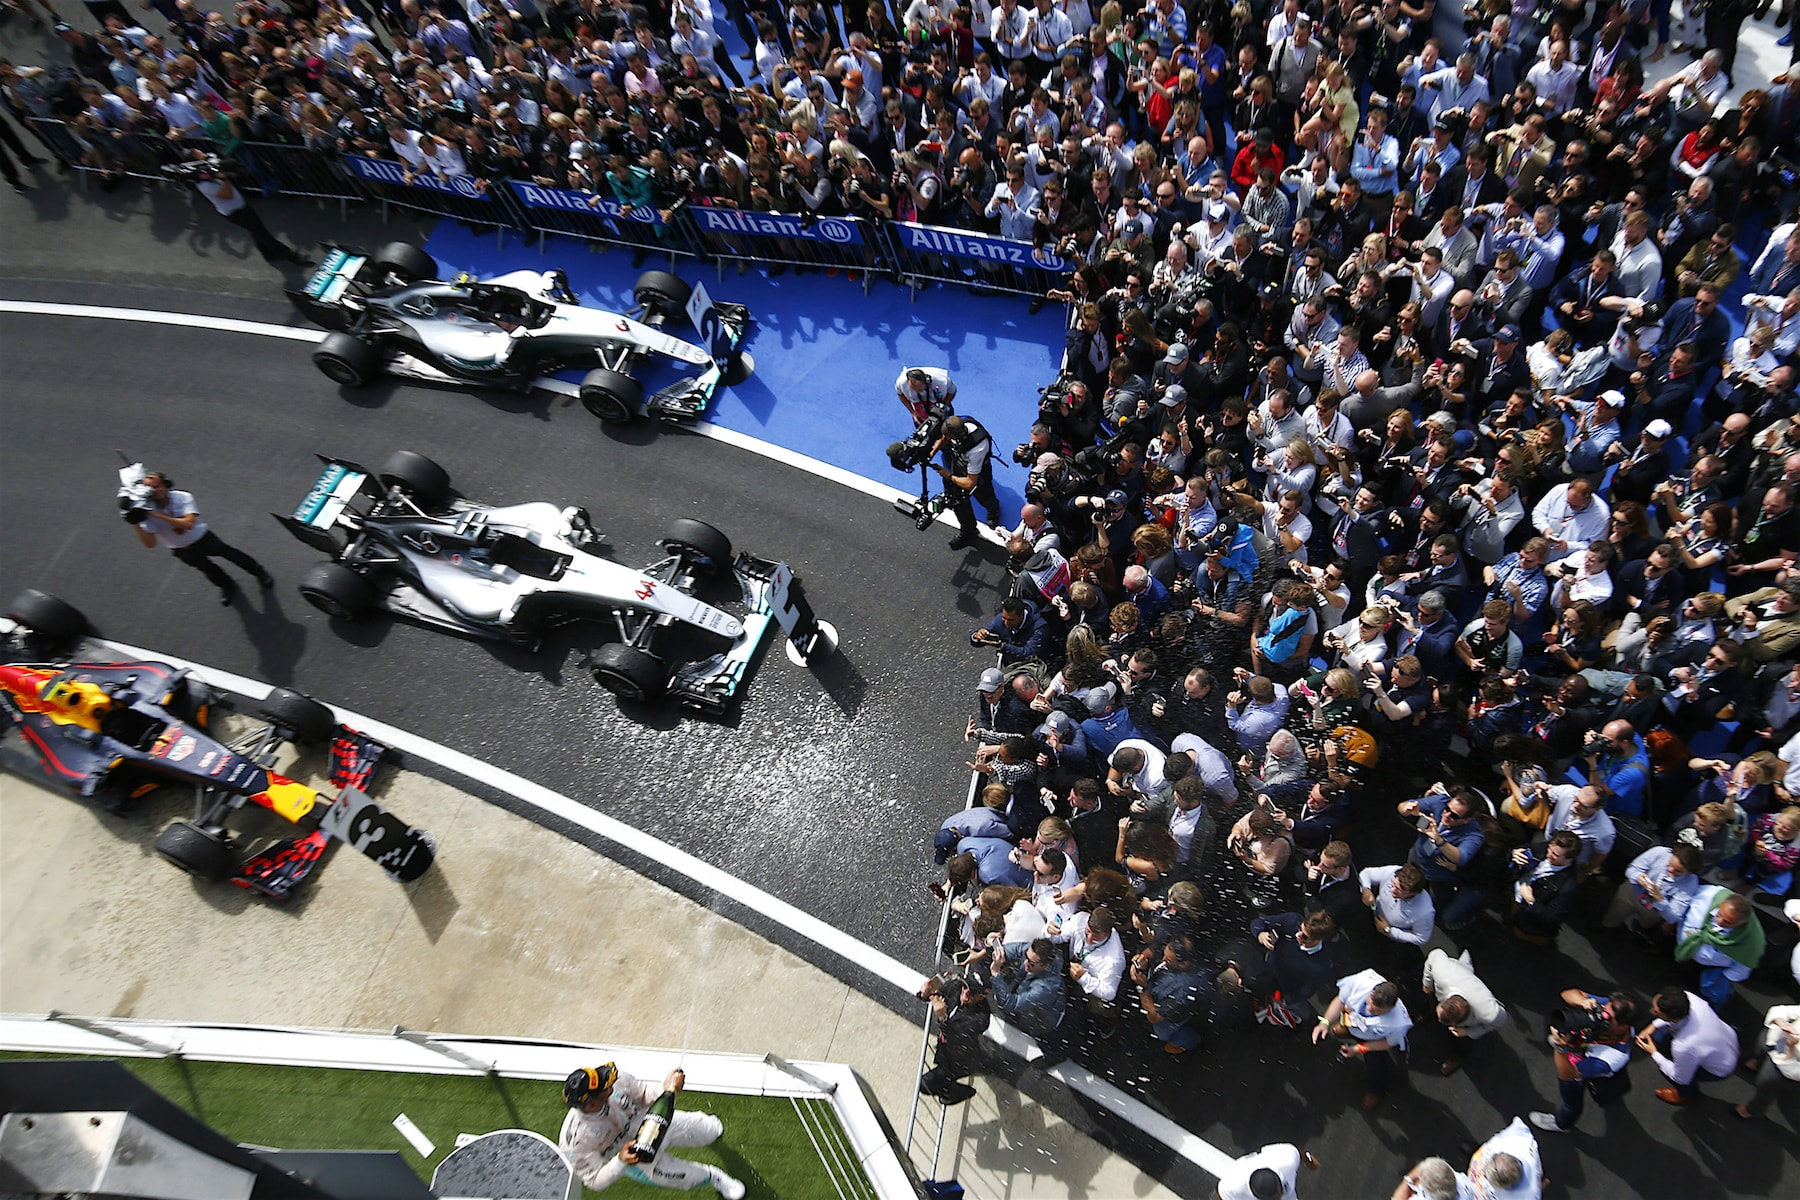 Salracing | British Grand Prix podium celebrations